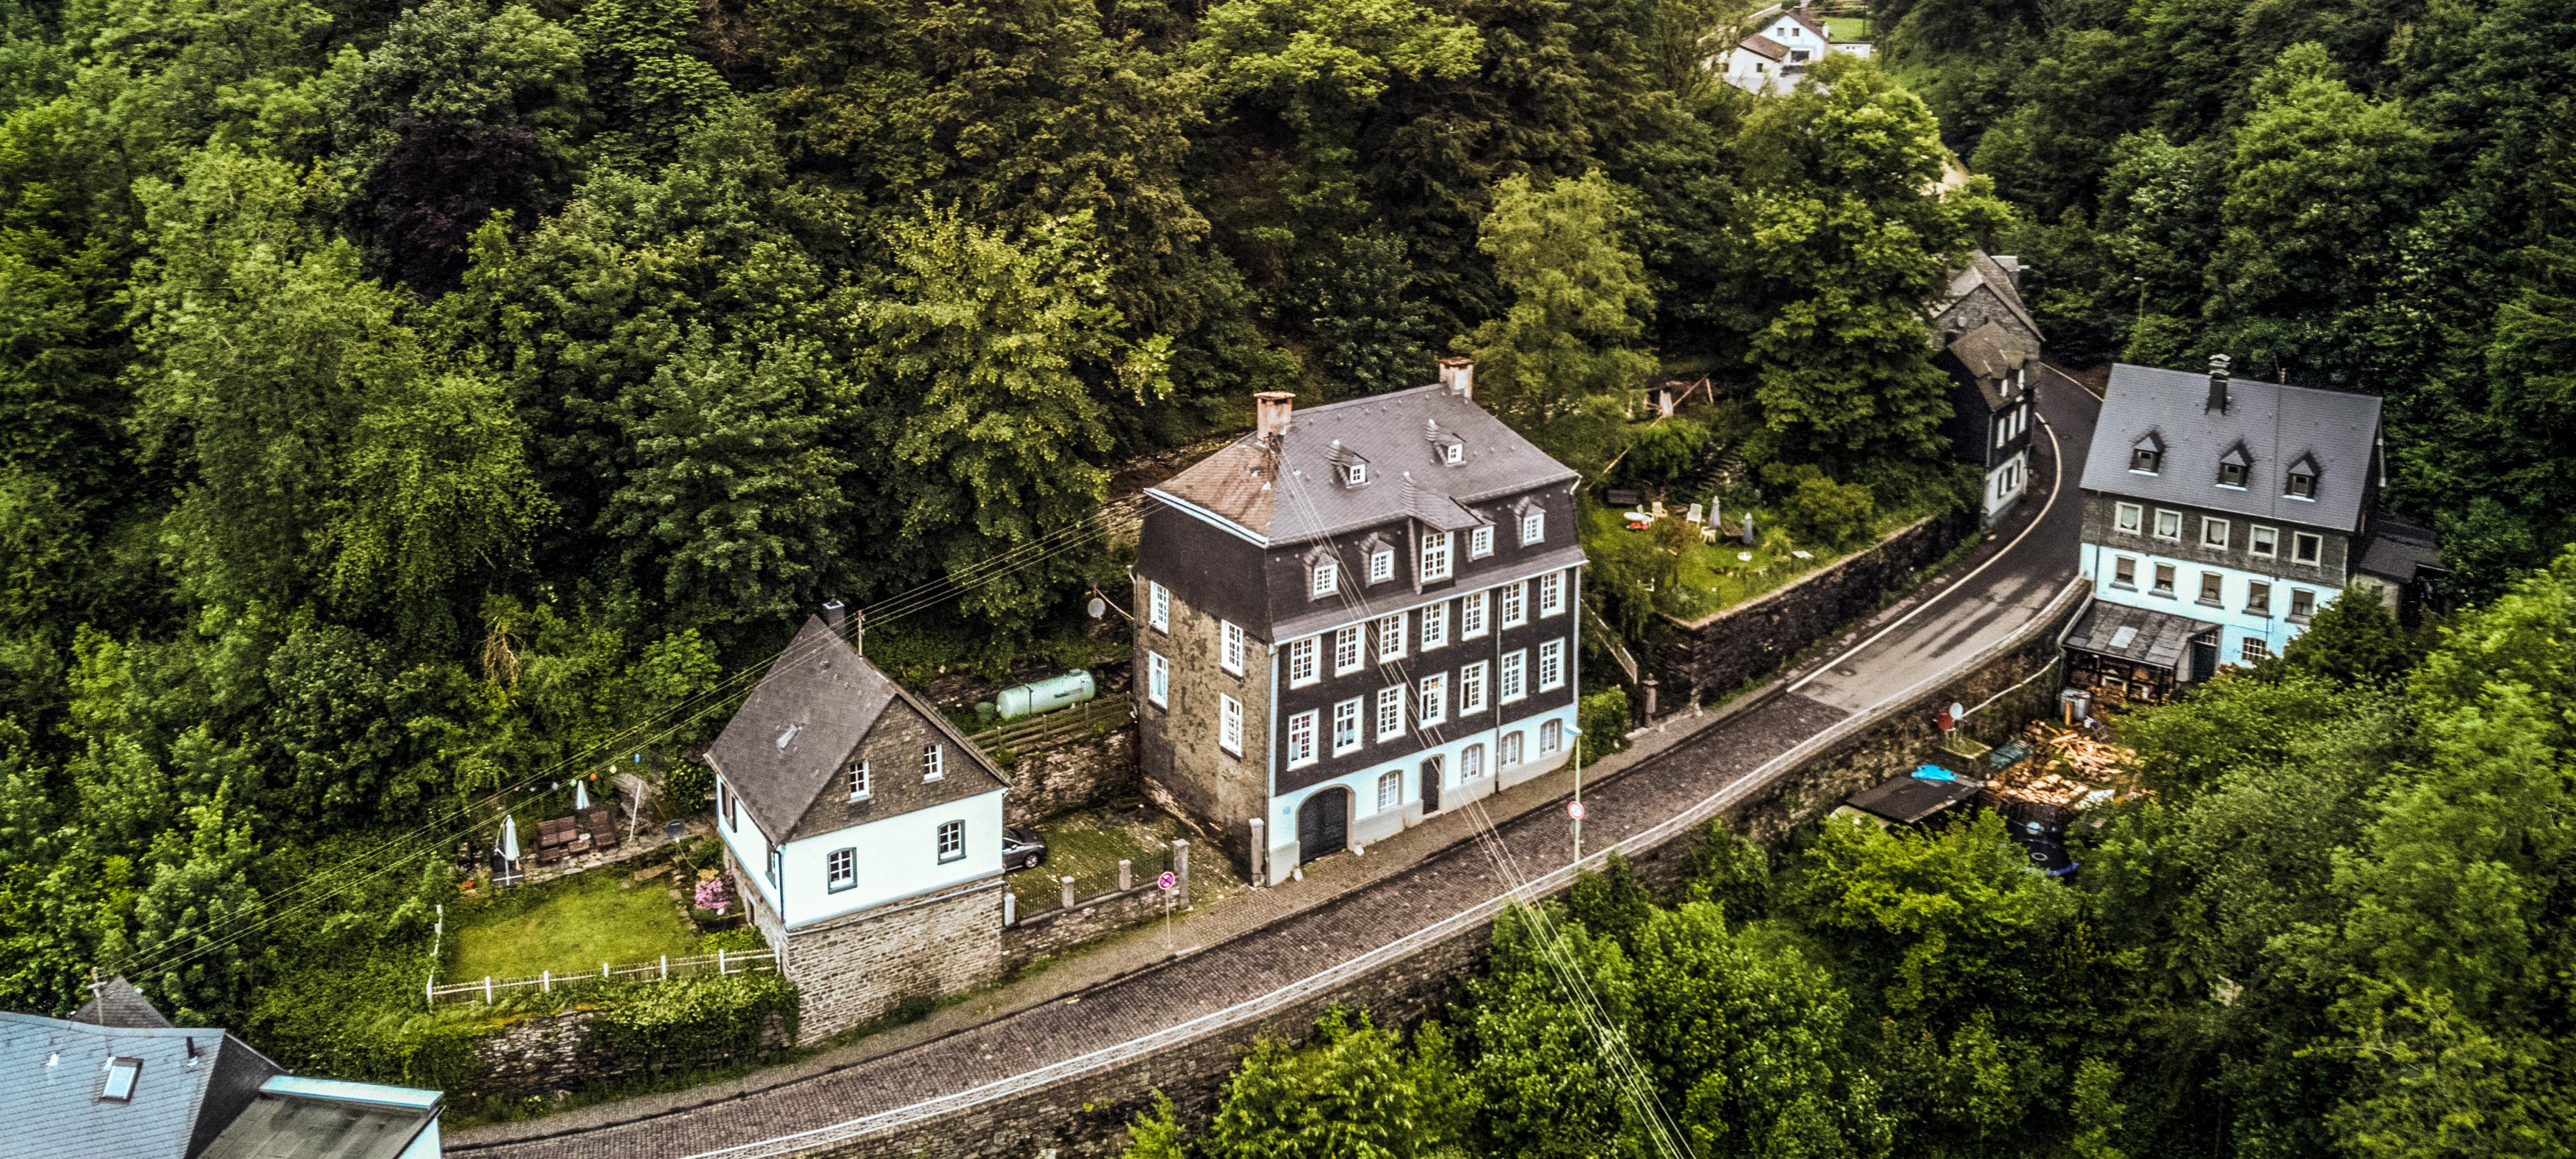 Haus Barkhausen